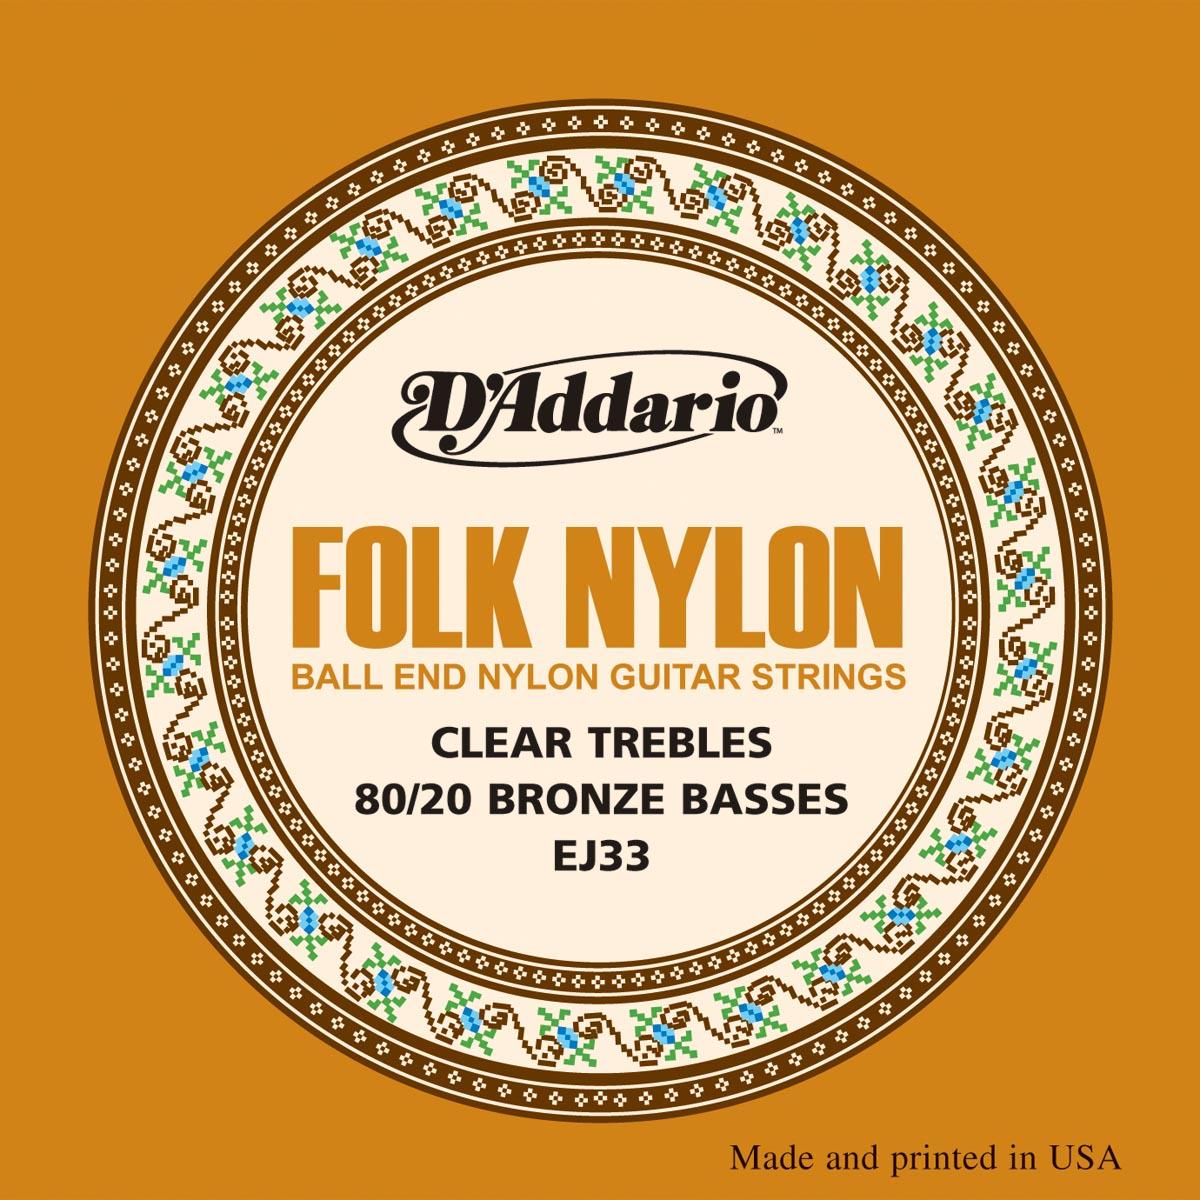 D'ADDARIO EJ33 Folk Nylon, Ball End, 80/20 Bronze/Clear Nylon